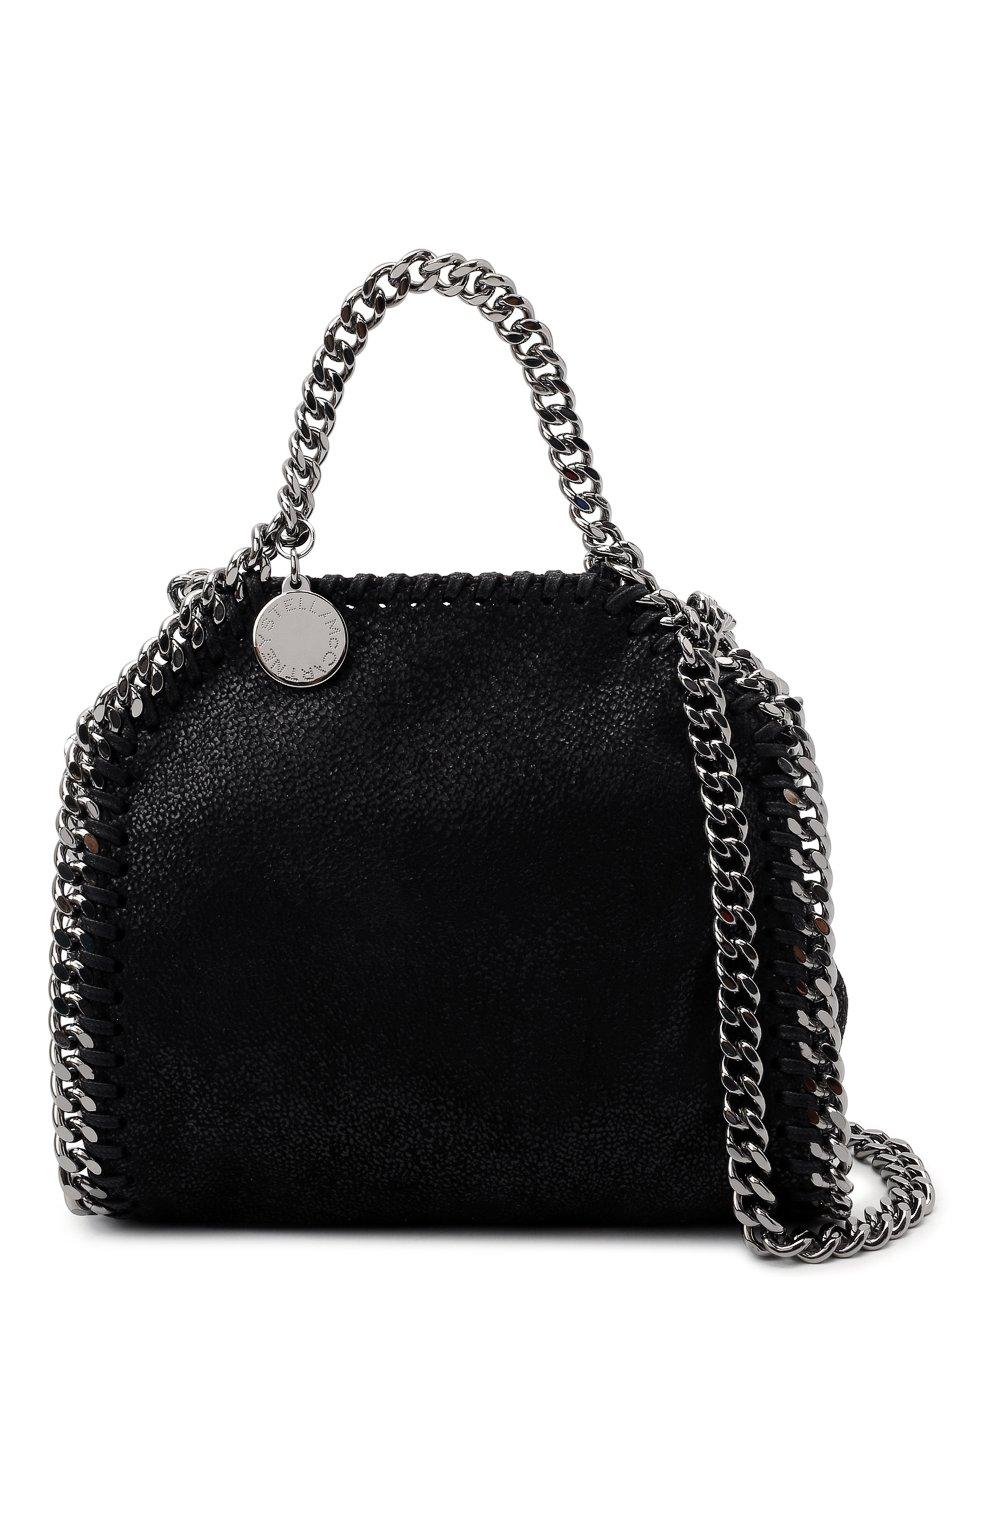 Женская сумка falabella STELLA MCCARTNEY черного цвета, арт. 700227/W9132   Фото 6 (Ремень/цепочка: С цепочкой; Сумки-технические: Сумки top-handle; Размер: mini; Материал: Текстиль)